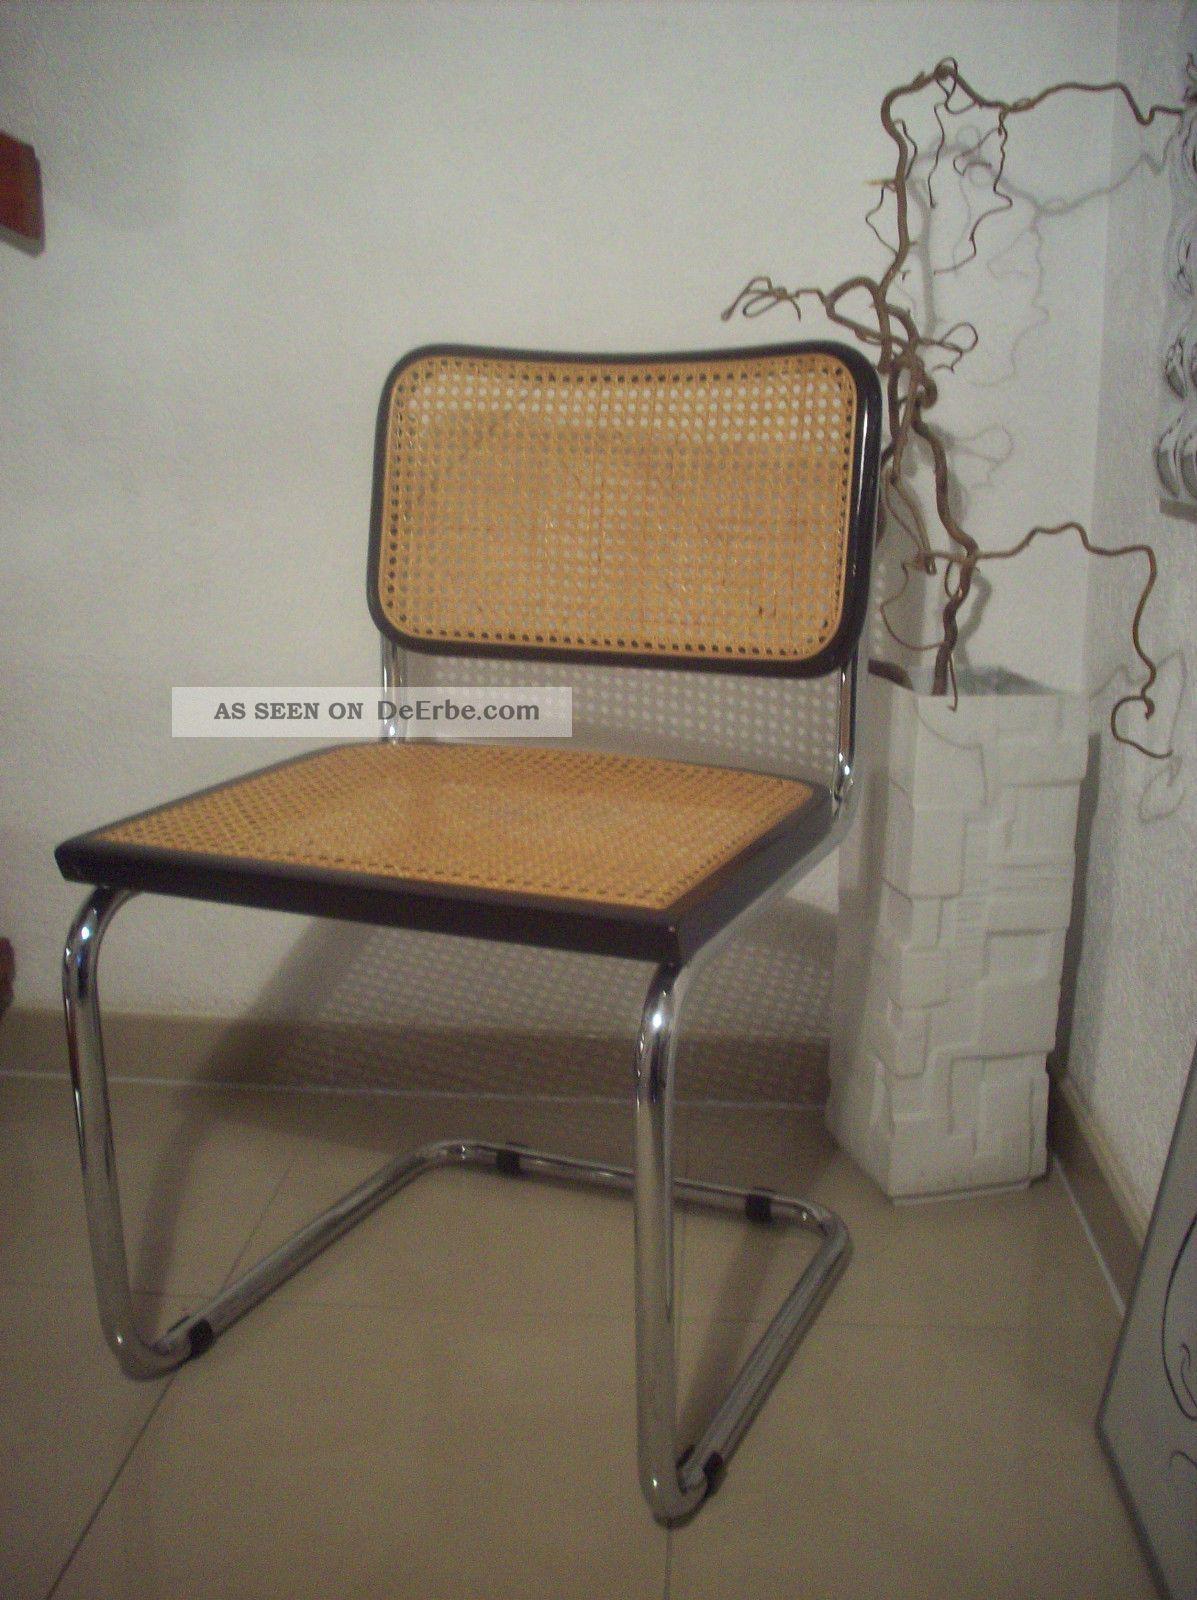 gavina s 32 freischwinger marcel breuer armlehnstuhl. Black Bedroom Furniture Sets. Home Design Ideas